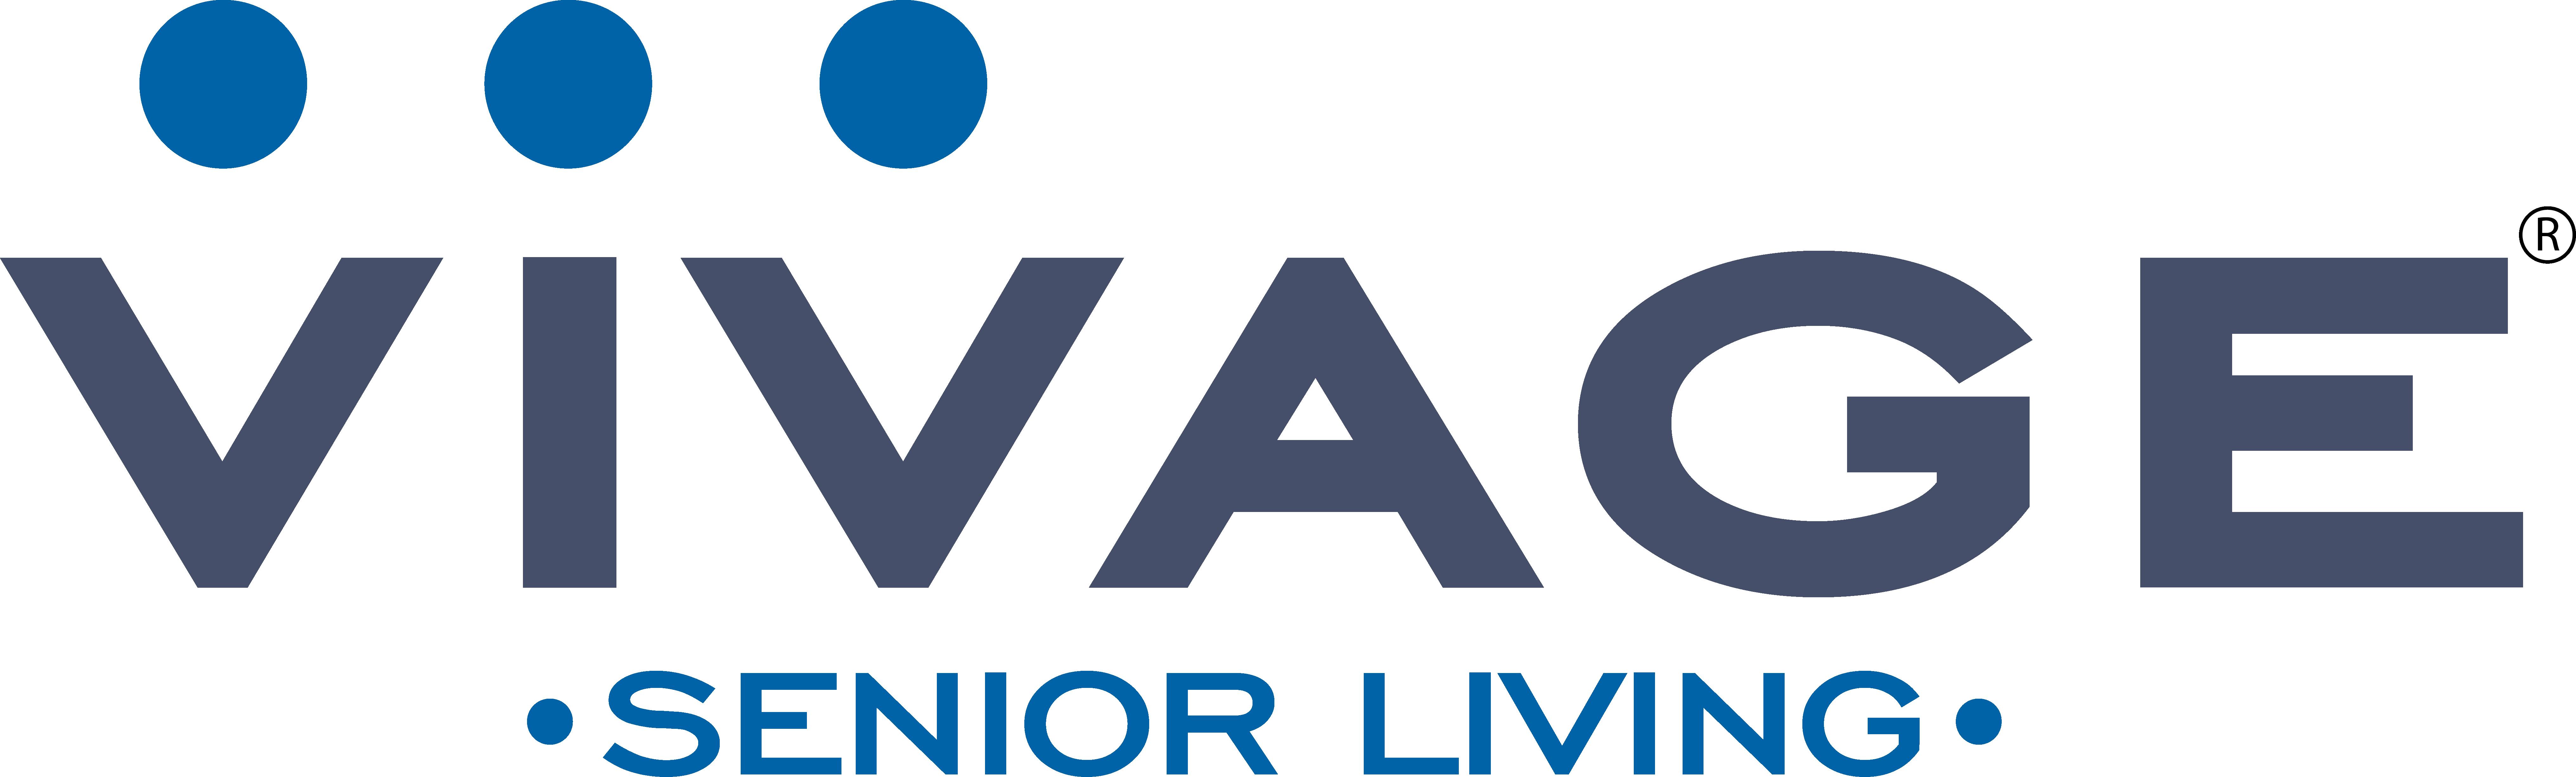 Vivage Senior Living logo